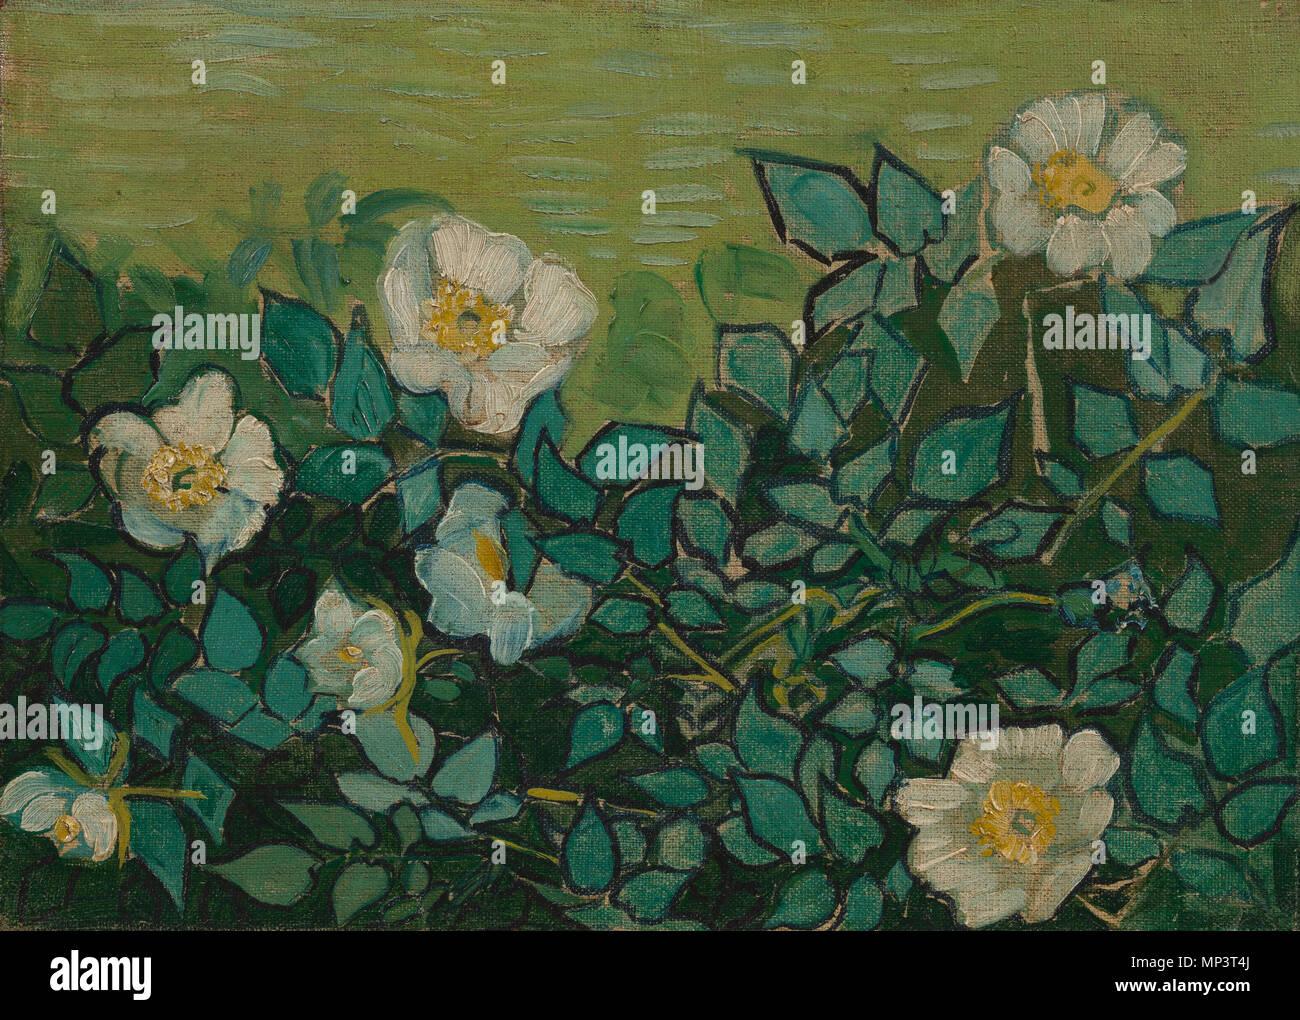 Vincent van gogh roses van gogh museum stock photos & vincent van